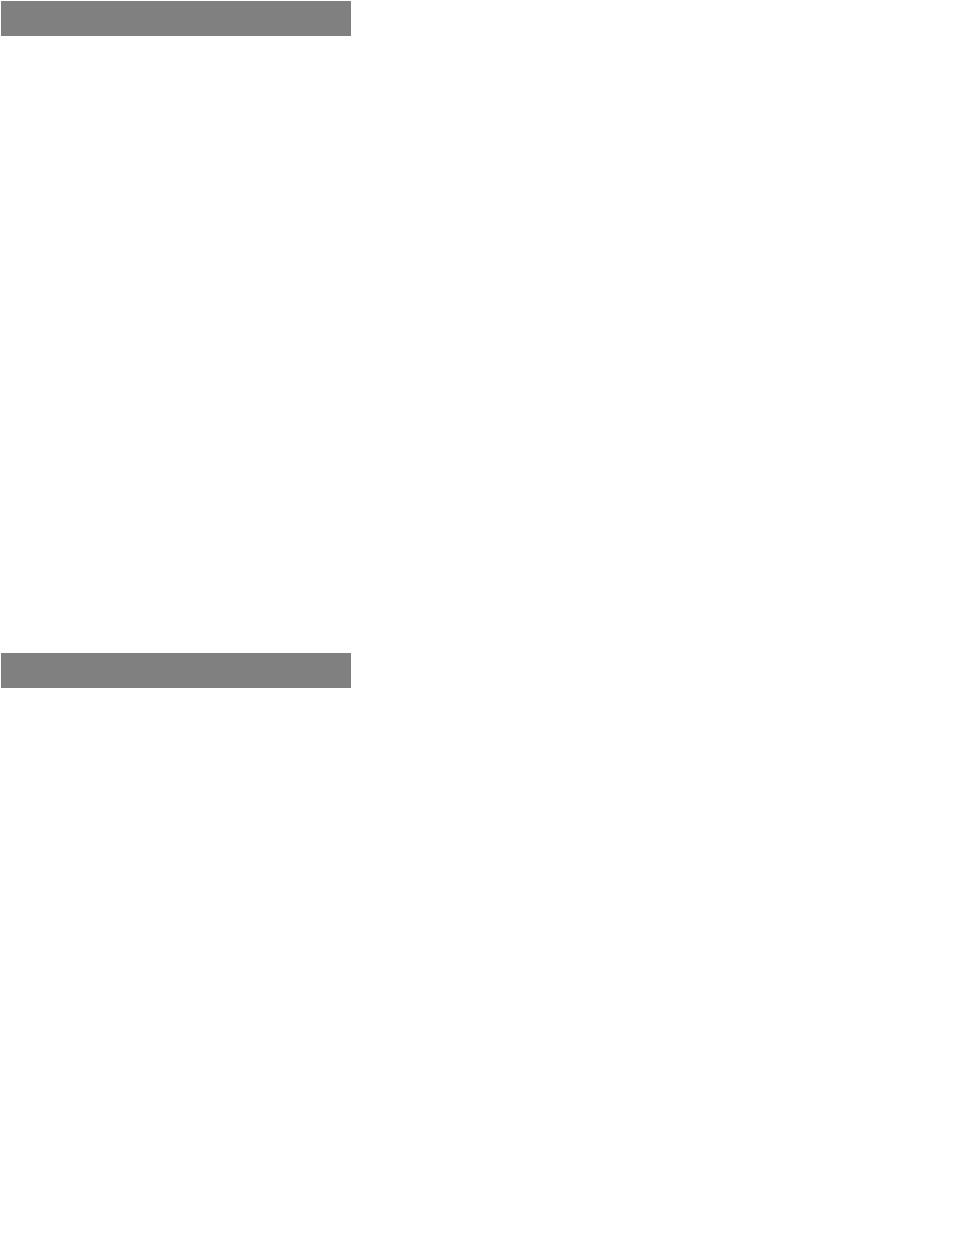 last number redial spectralink ptb410 user manual page 33 38 rh manualsdir com Kindle Fire User Guide spectralink ptb410 user manual